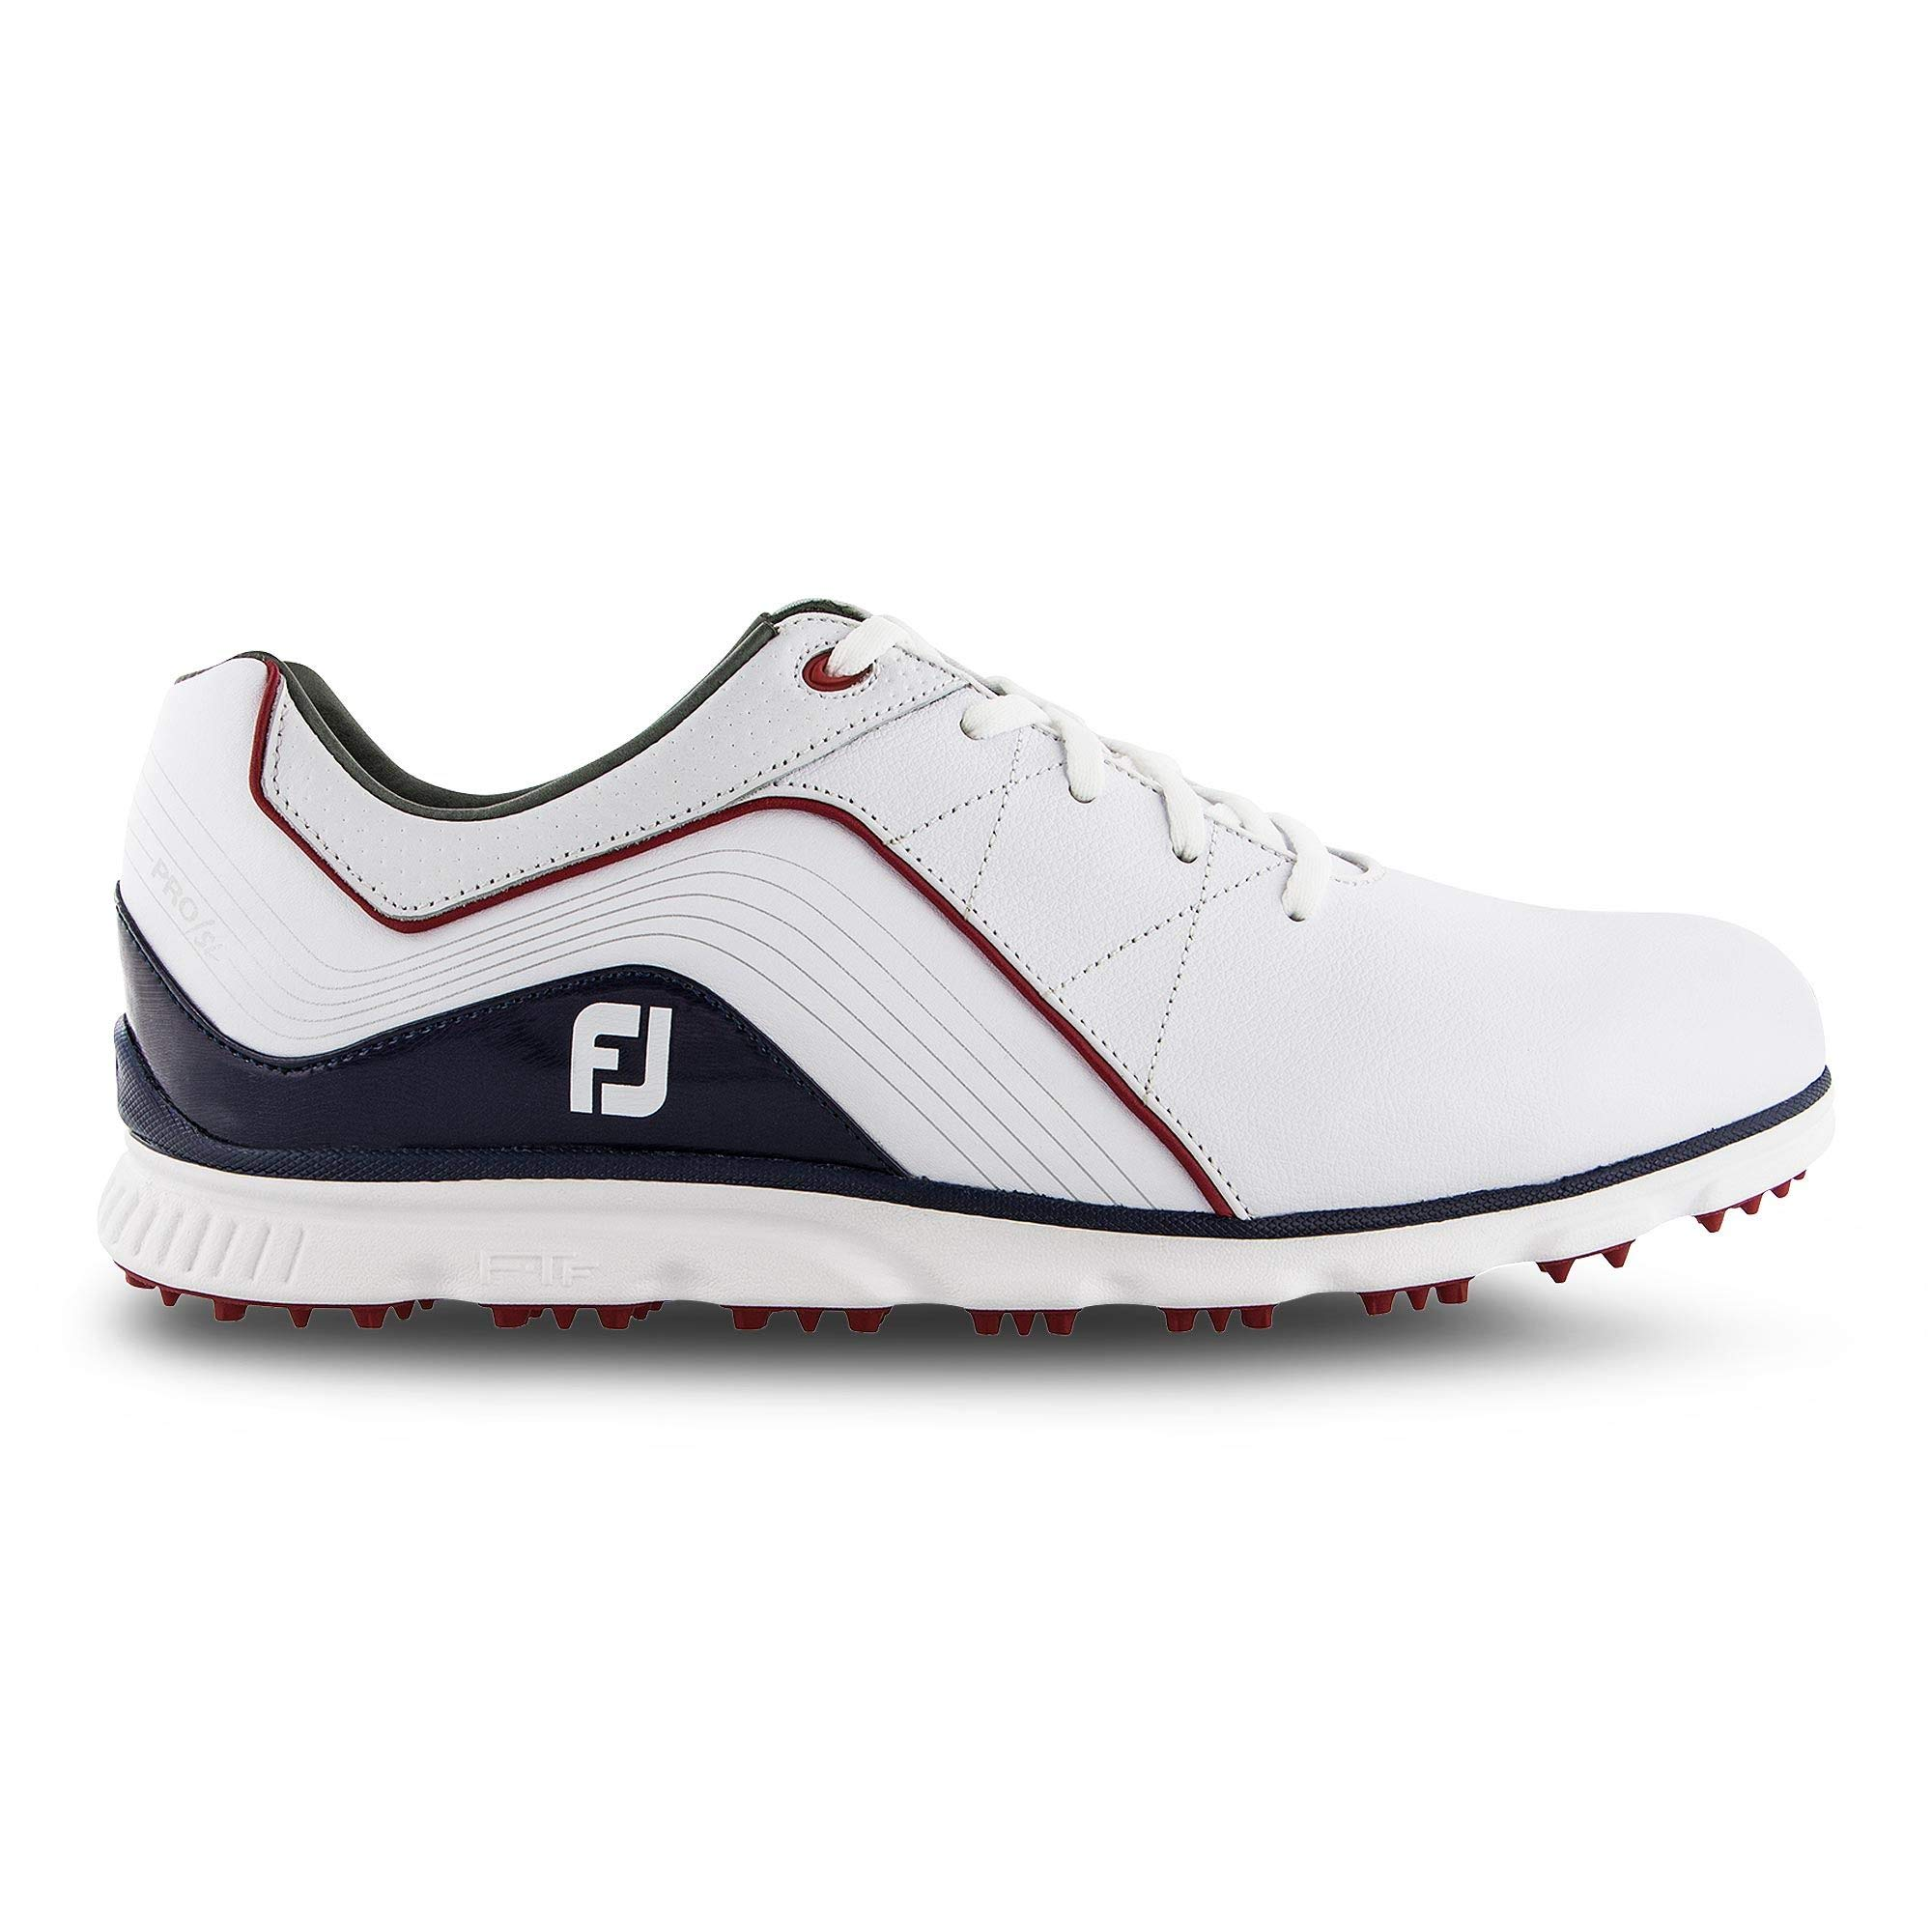 FootJoy Men's Pro/SL Golf Shoes White 11.5 XW Navy, US by FootJoy